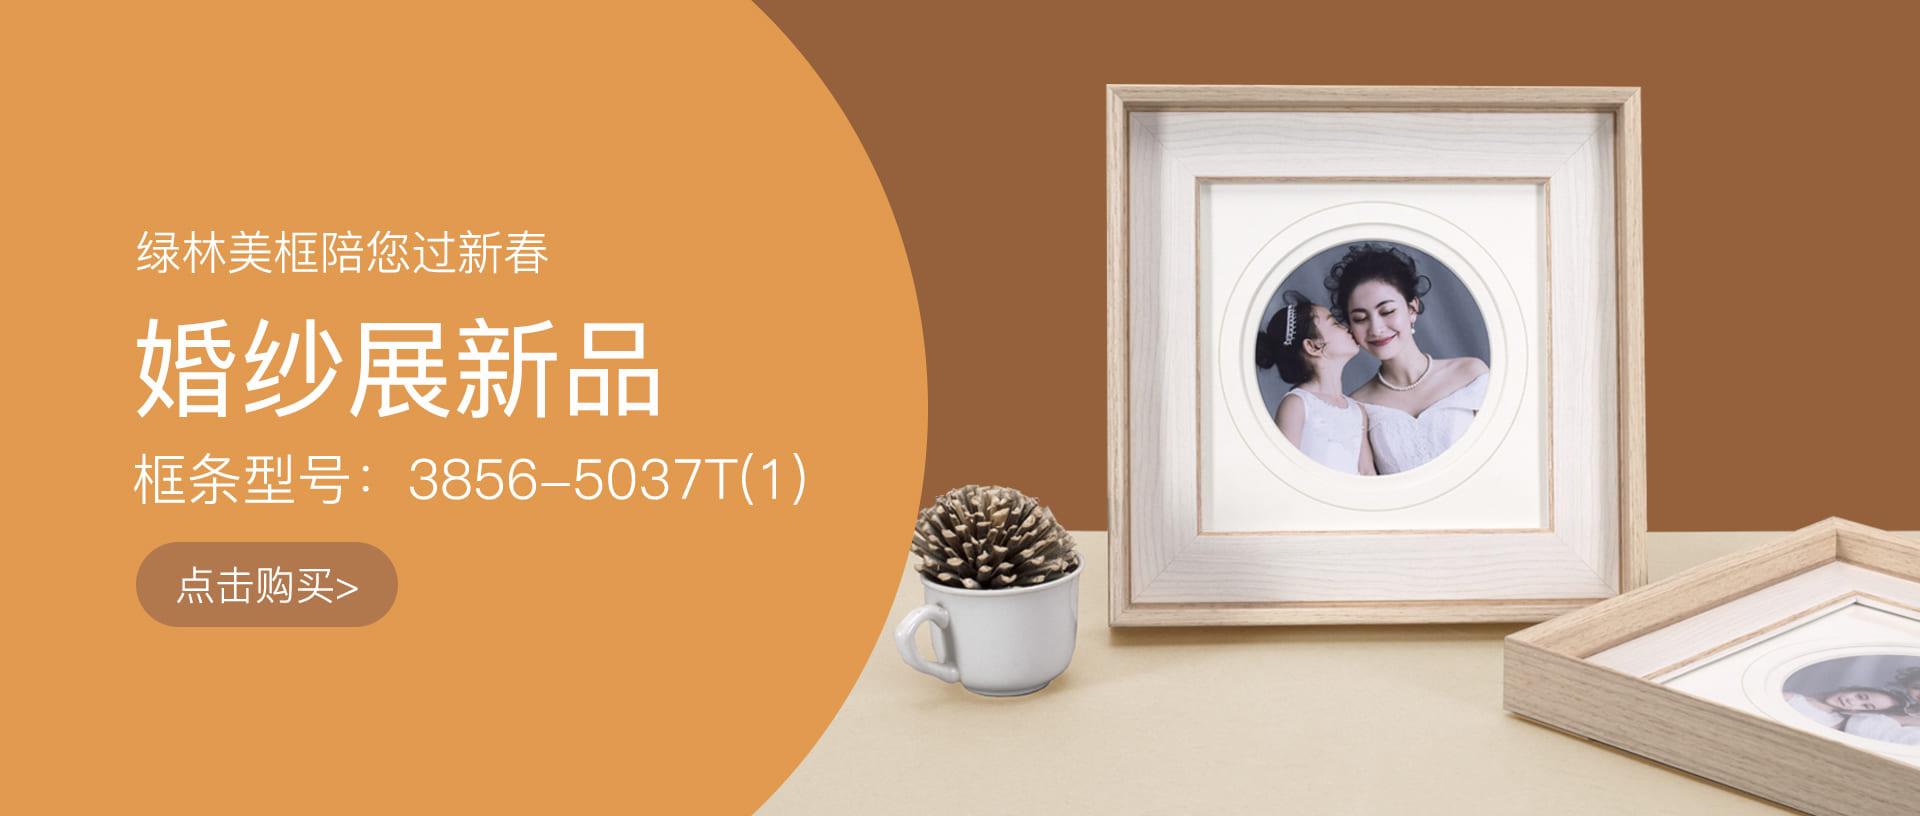 绿林新款婚纱PS相框线条3856-5037T在线购买banner